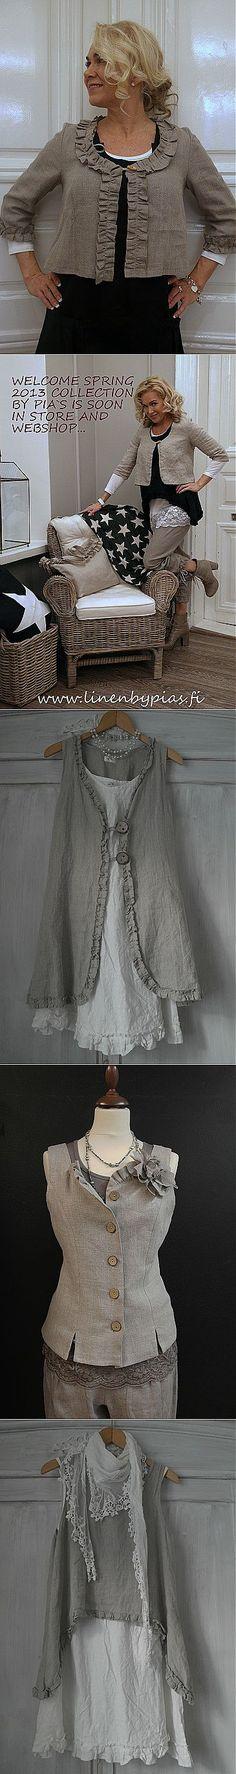 Льняная одежда  в  стиле бохо от Olen Pia Erlund.